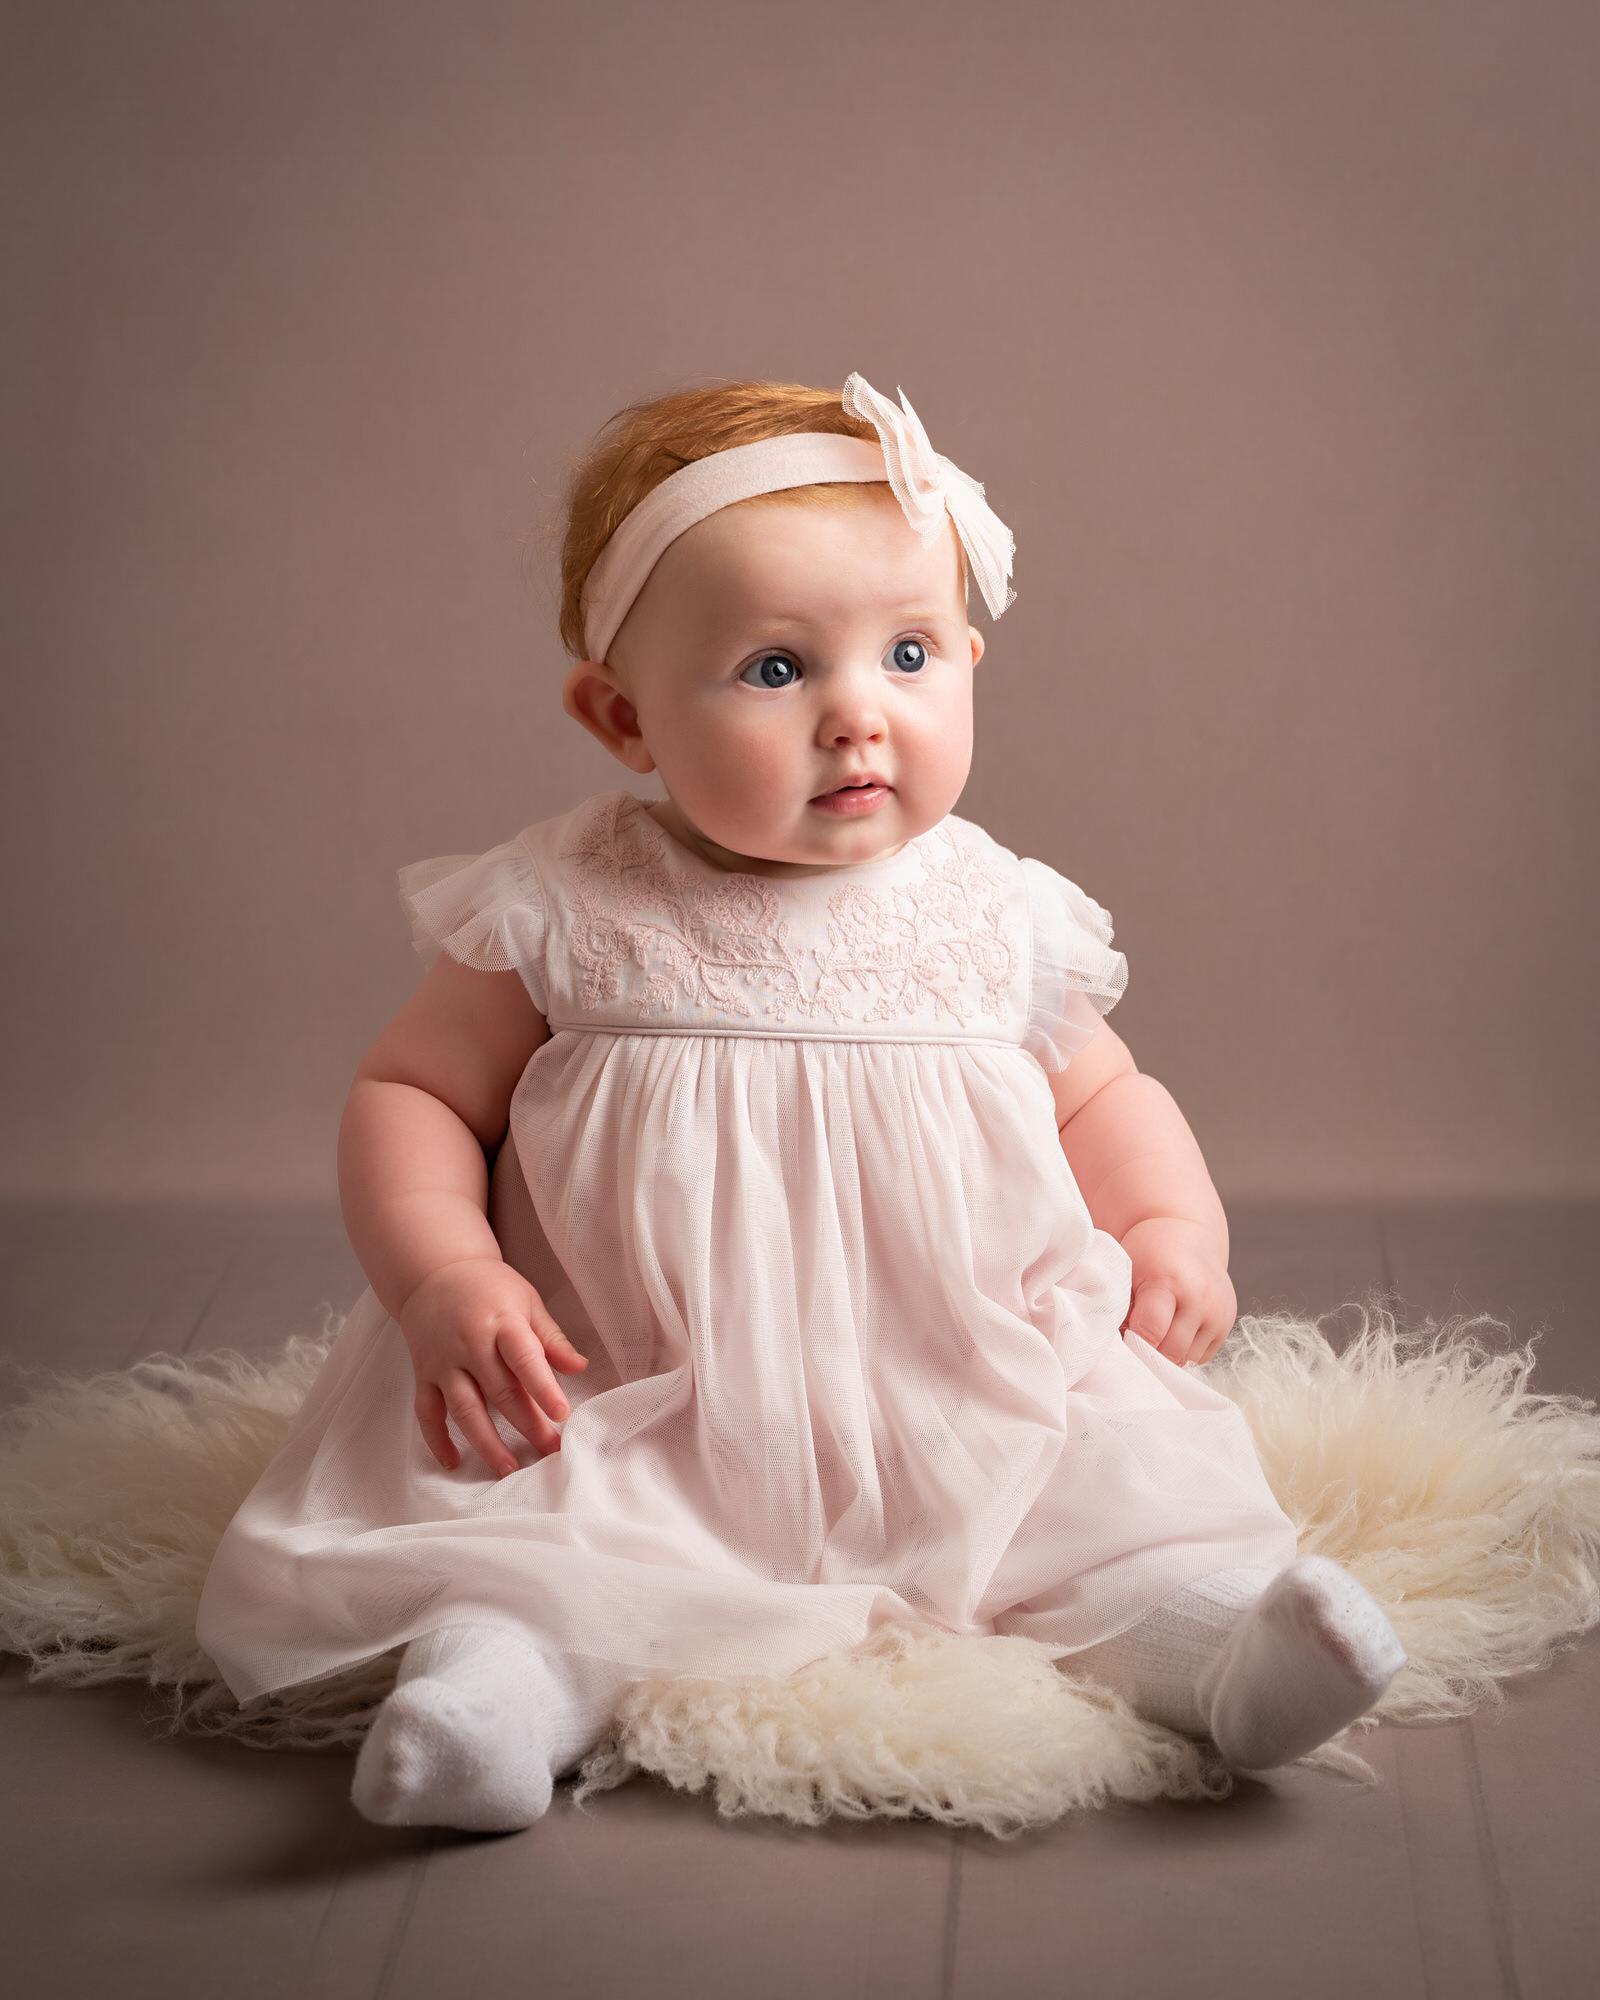 Newborn_baby_photographer_dudley_midlands_posing_on_fur